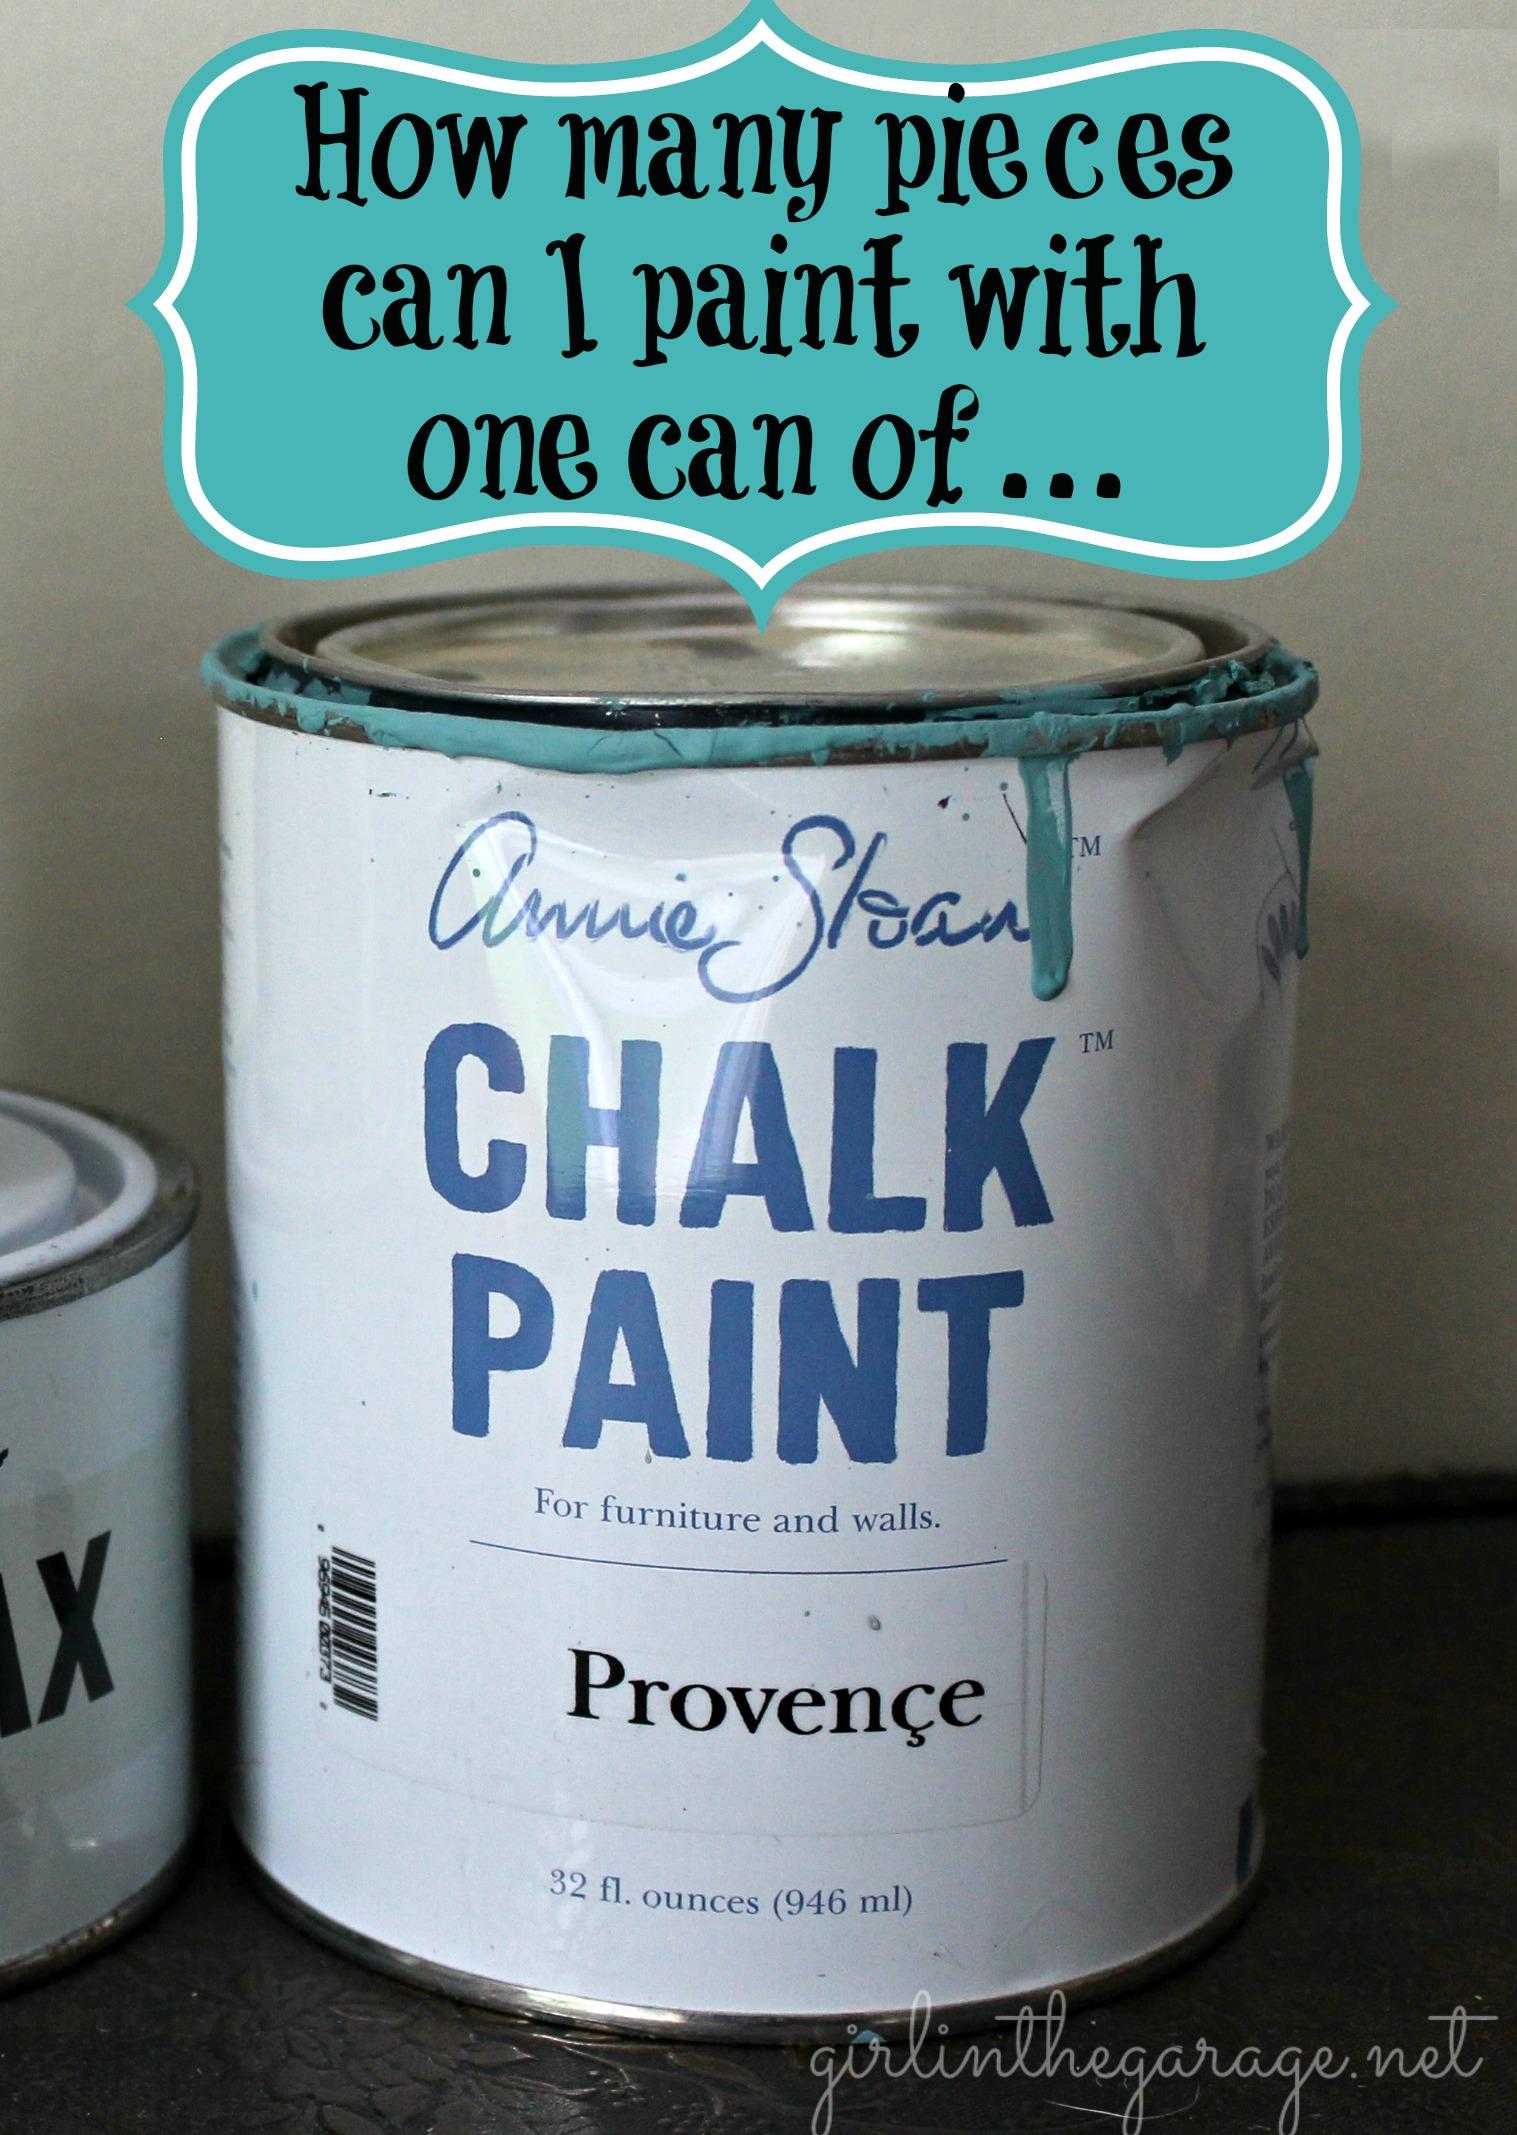 Purchase annie sloan chalk paint - Purchase Annie Sloan Chalk Paint So